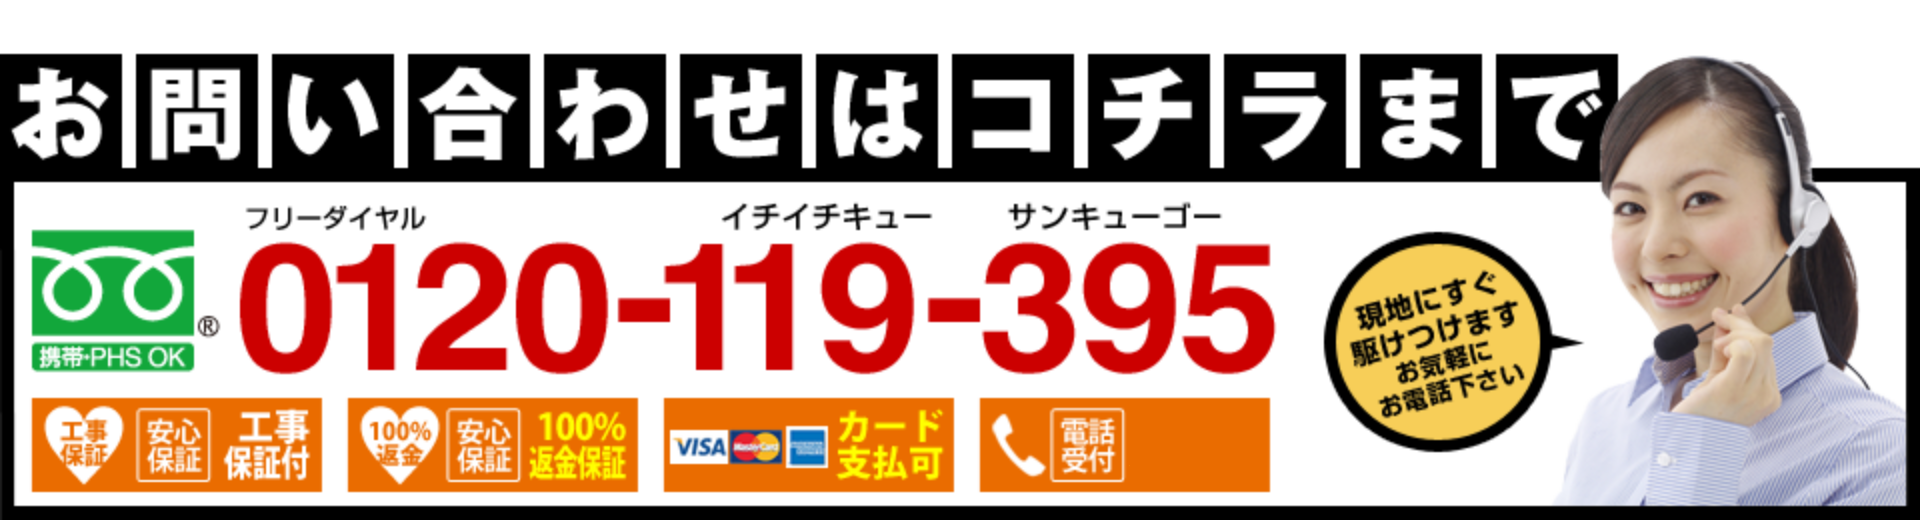 0120-119-395